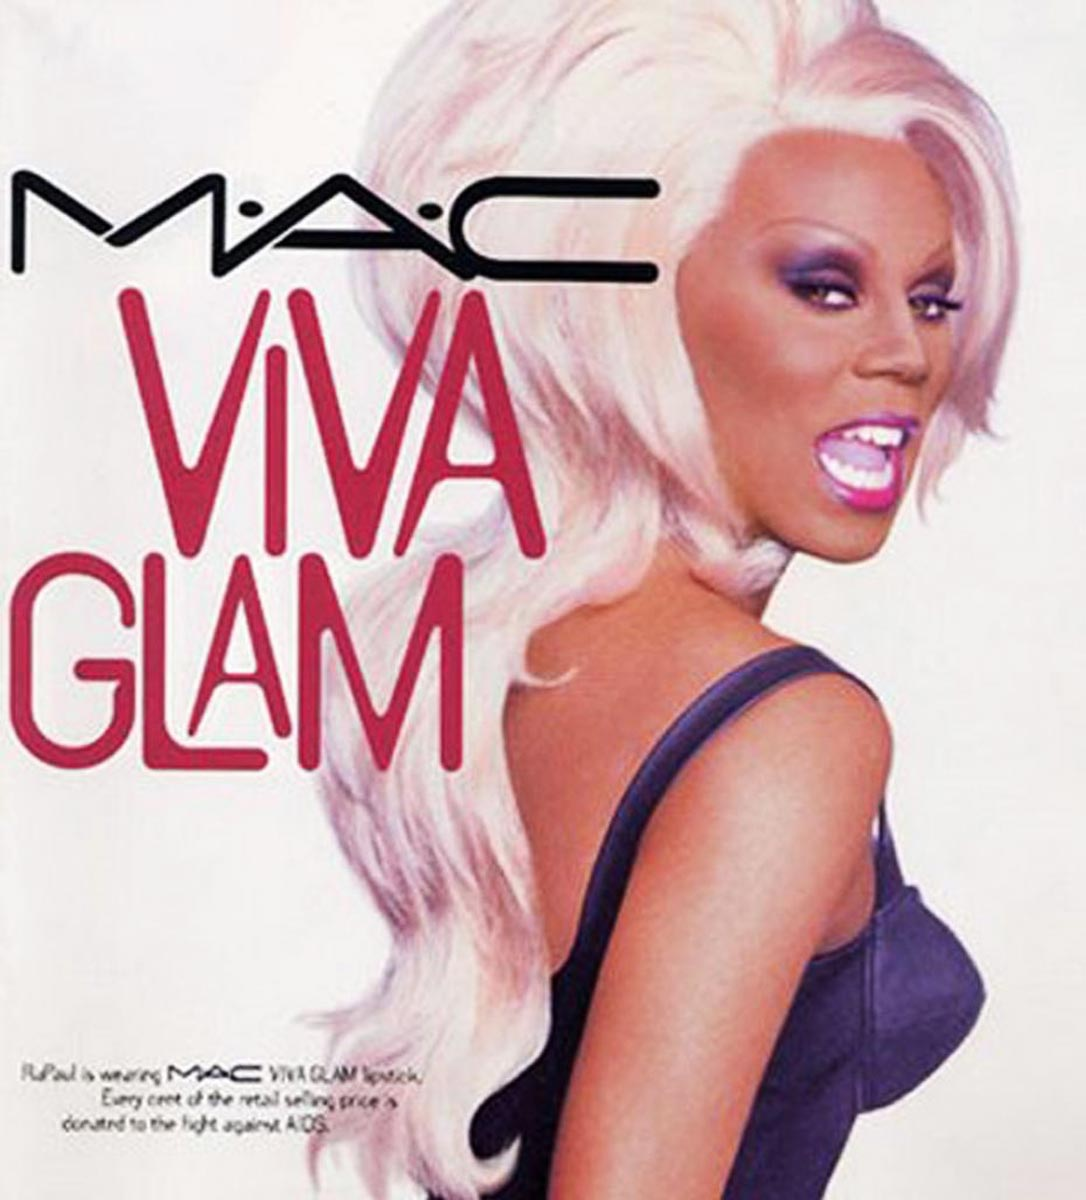 MAC Viva Glam